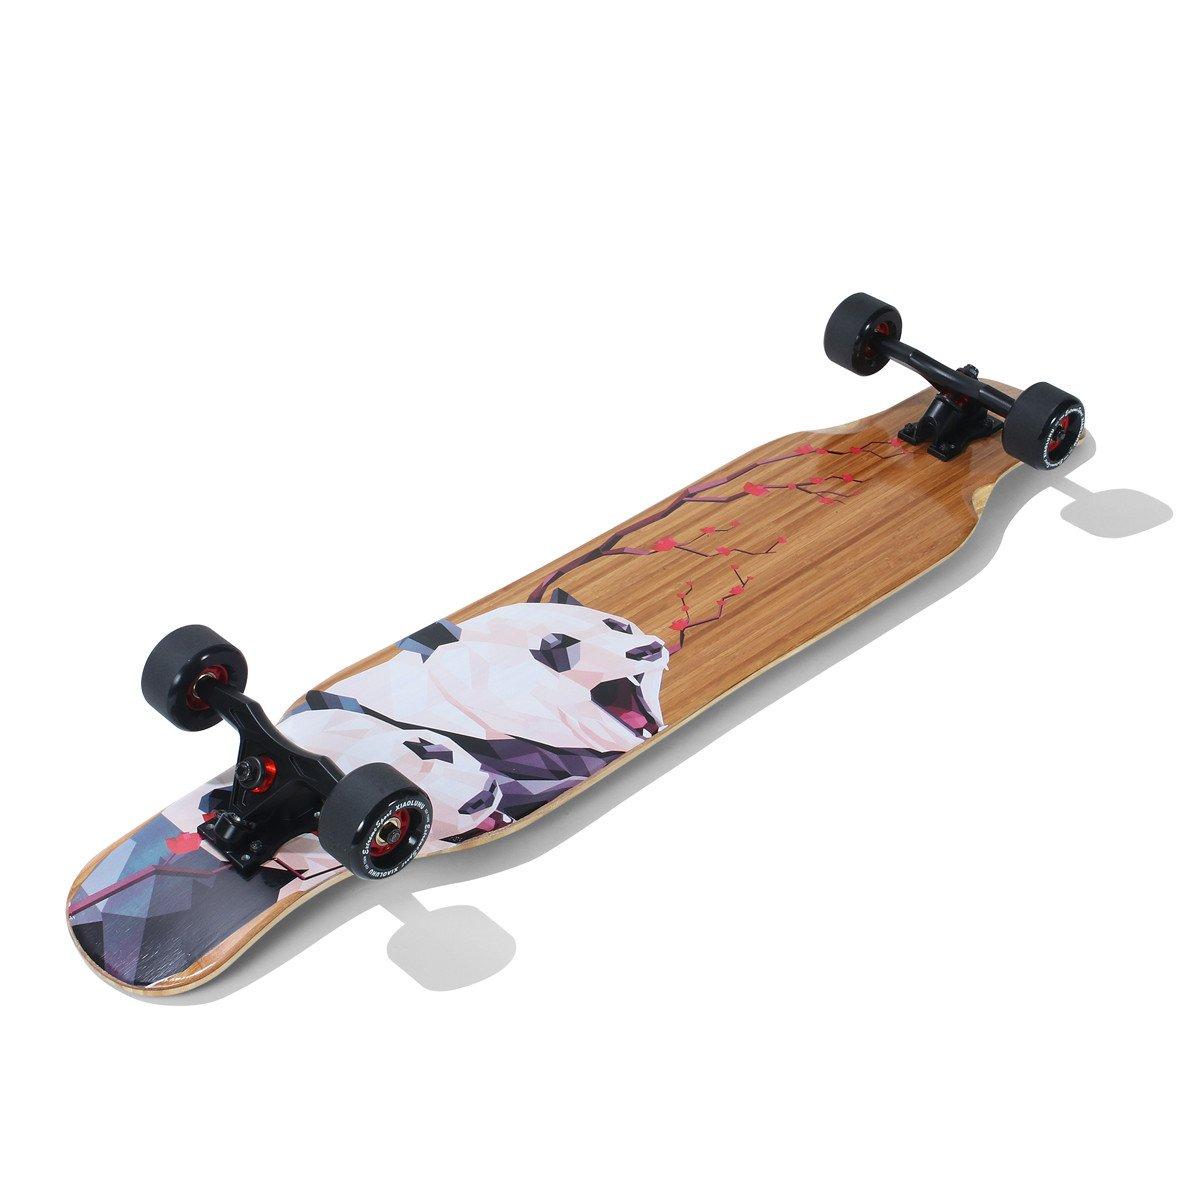 Mengzice 42 Inchs Bamboo and Fiberglass Drop Through Longboard Skateboard